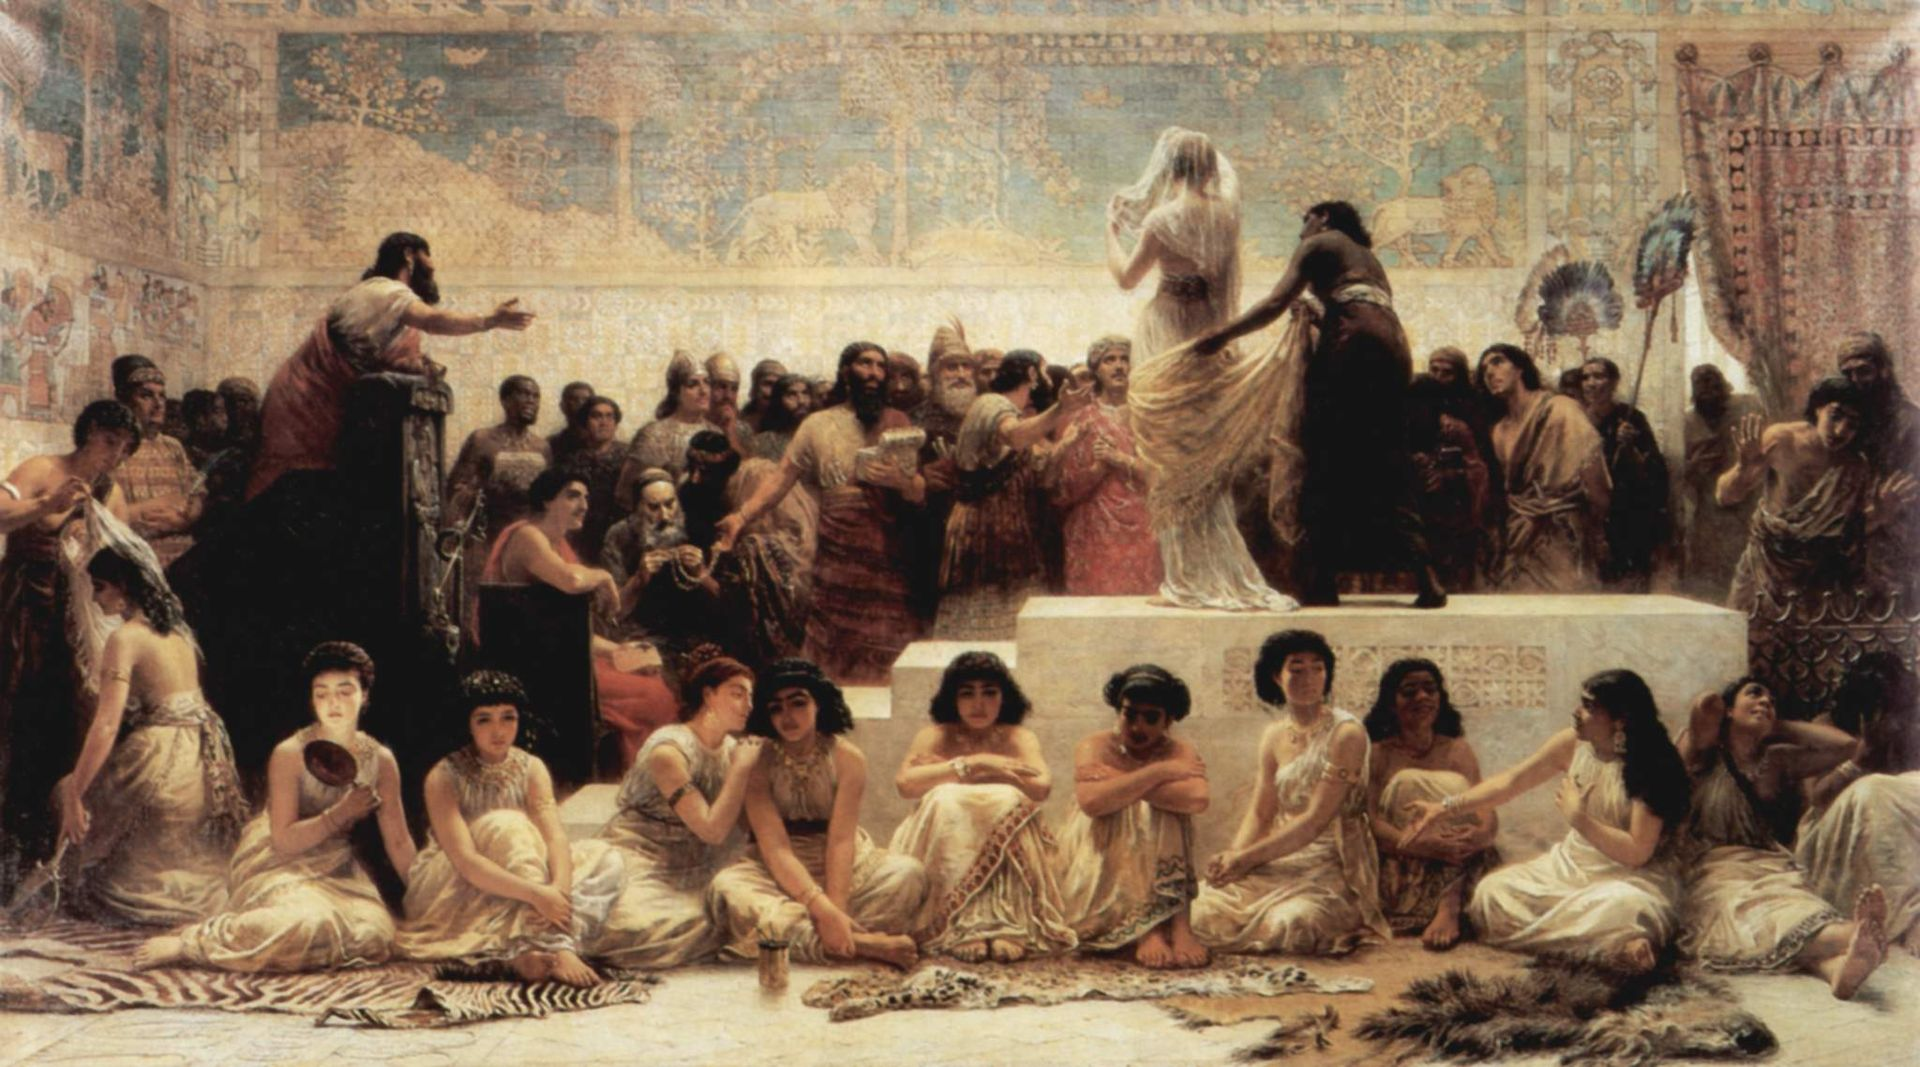 Slave gelding fantasy stories adult toons